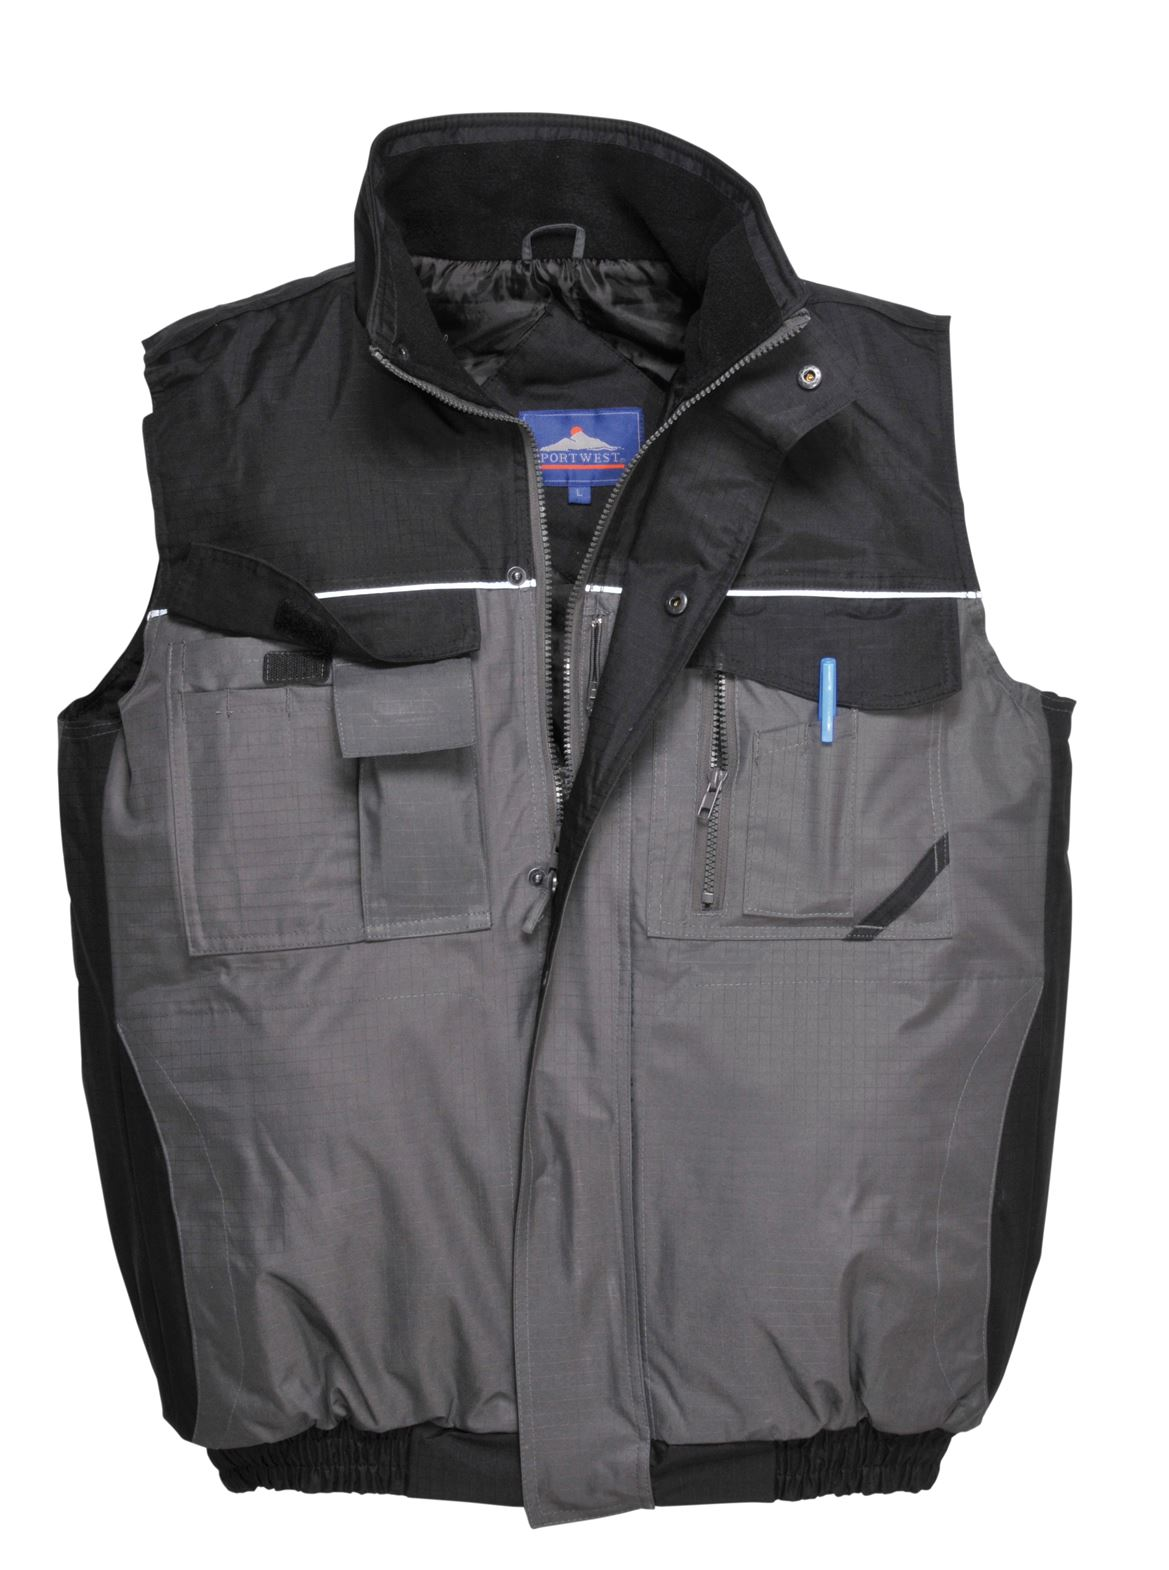 Gilet Matelassé Gilet Gilet 2tone imperméable multi poches S560 workwear outdoors S560 poches 436b67